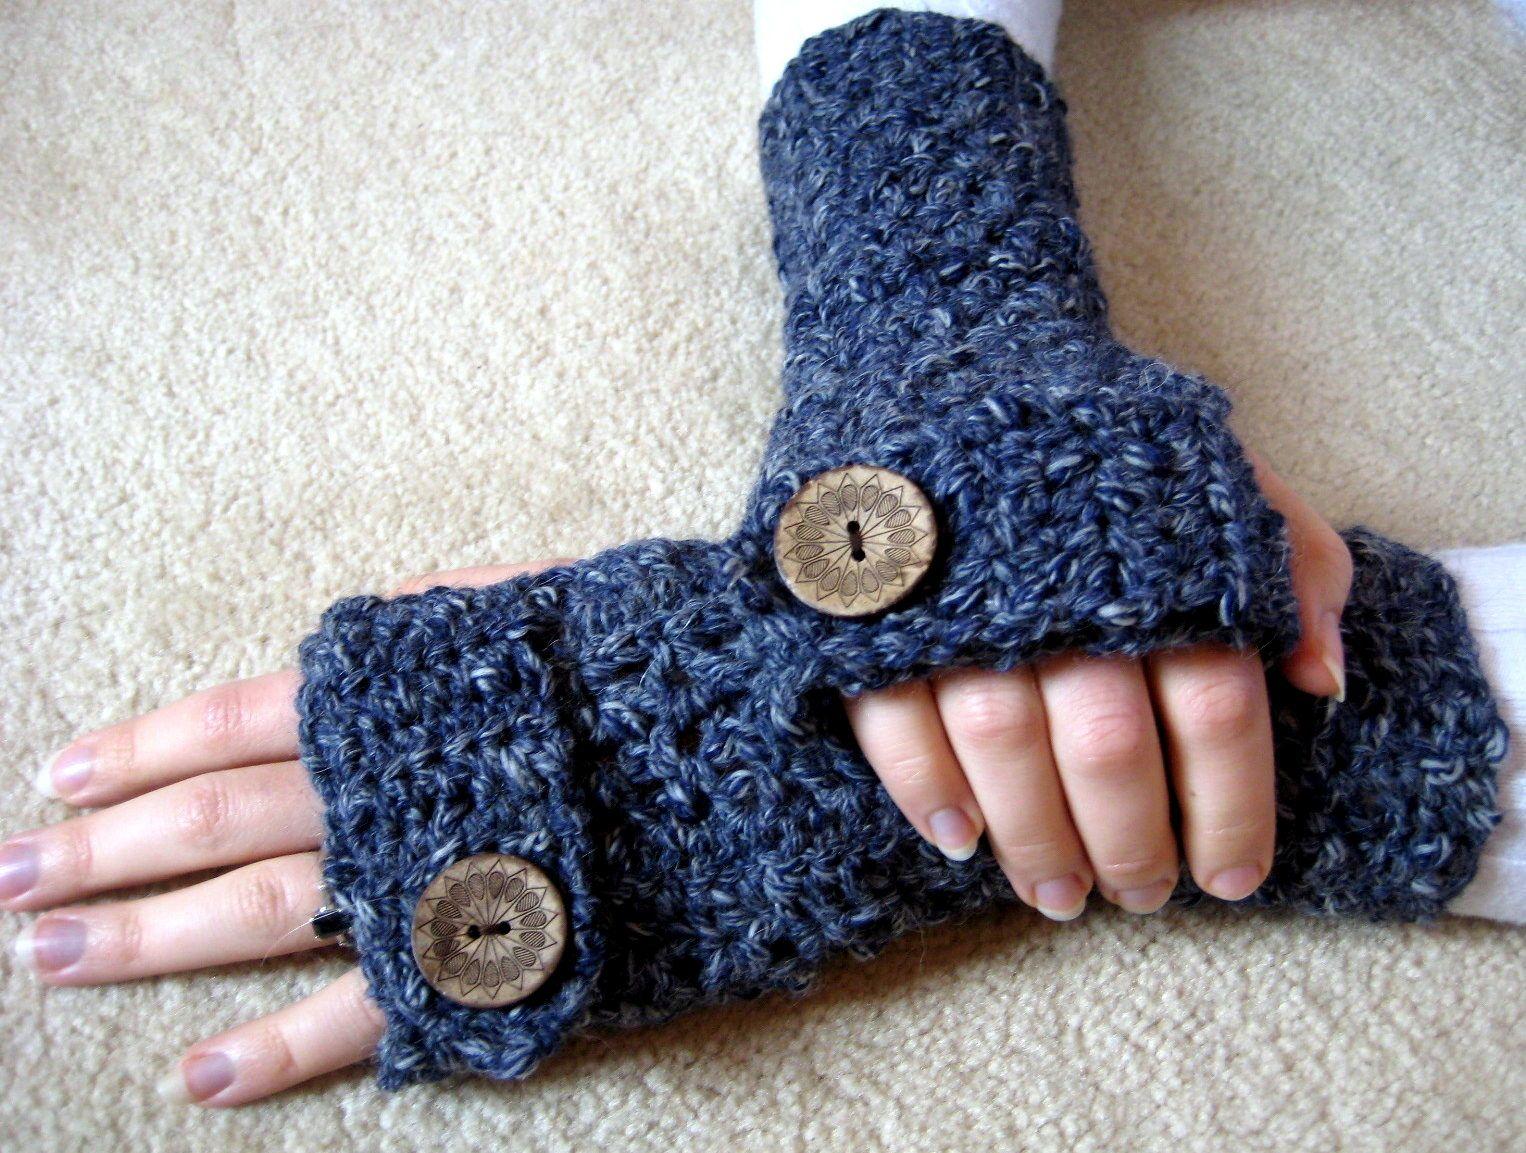 Easy Crochet Fingerless Gloves Pattern w/ Matching Cowl following ...